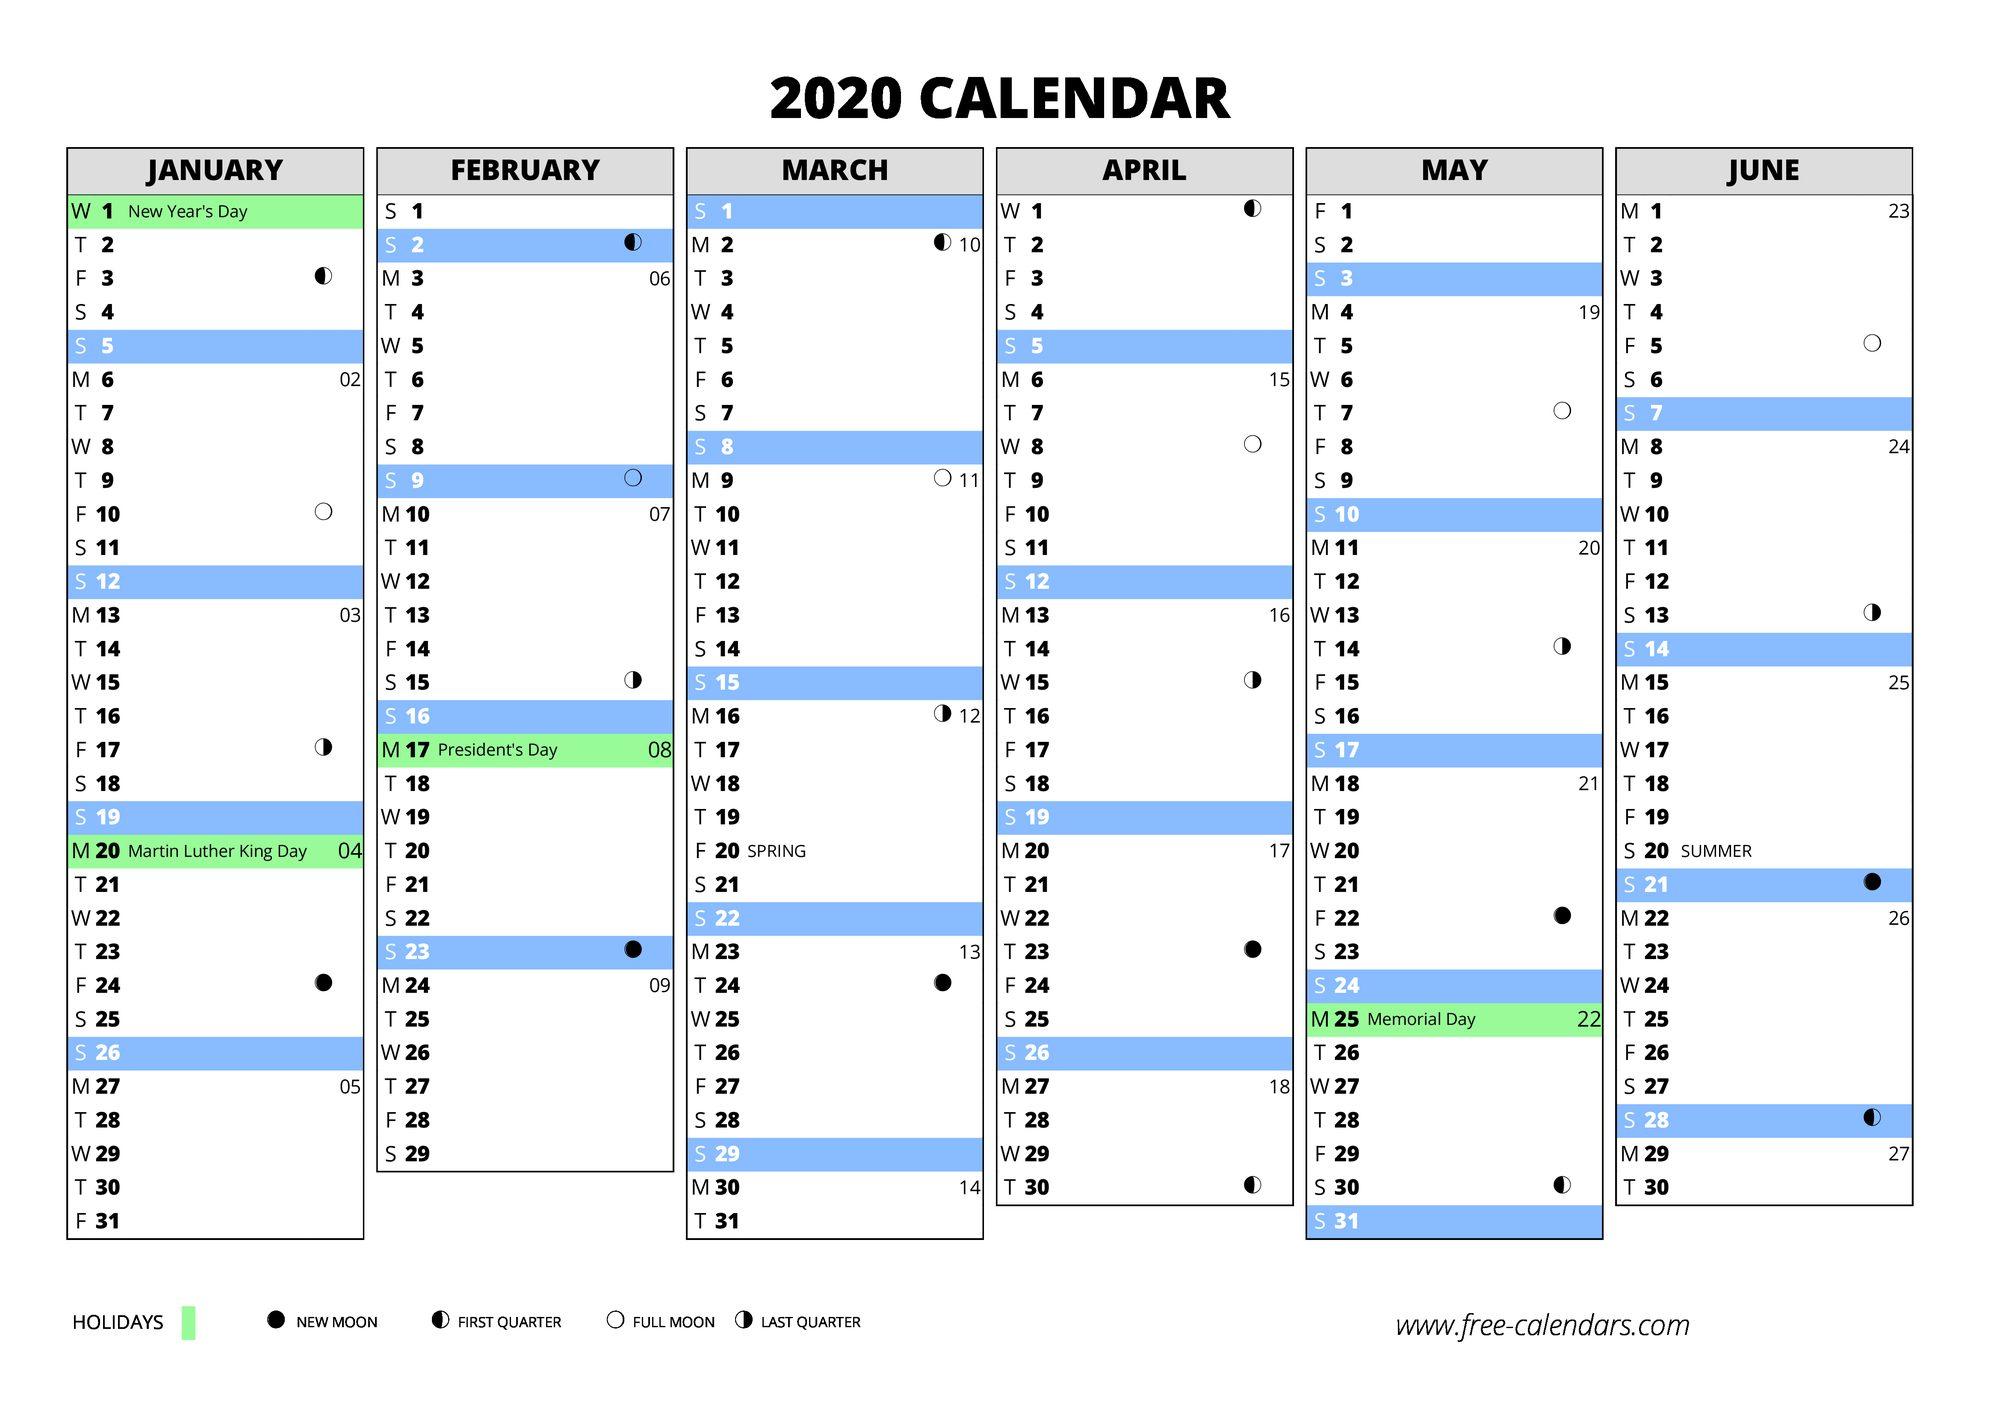 2020 Calendar ≡ Free-Calendars